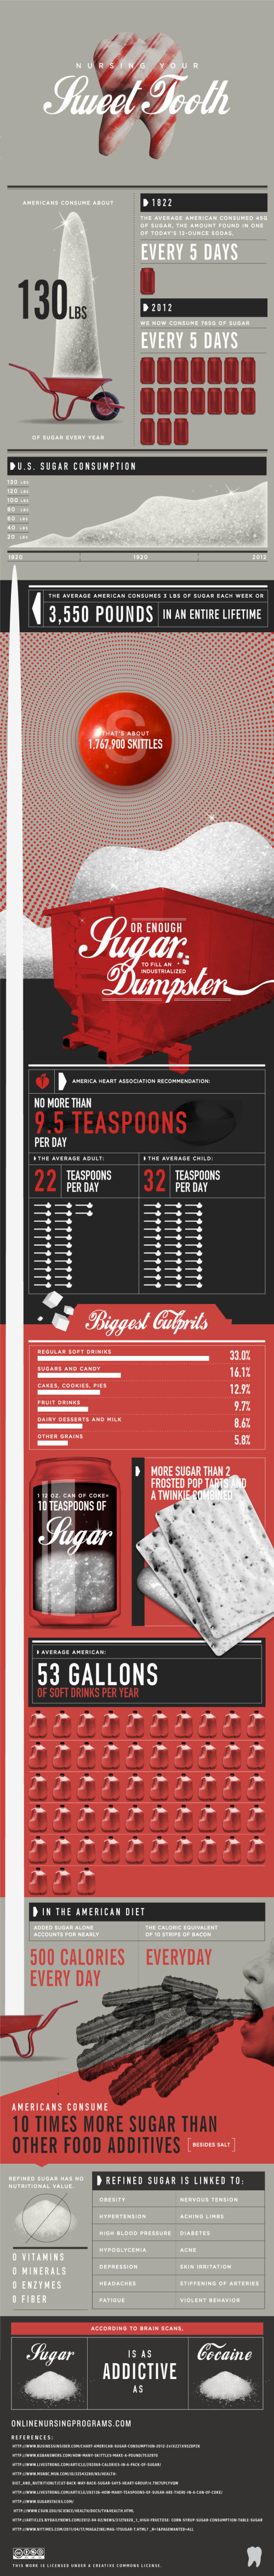 American Sugar Consumption Infographic